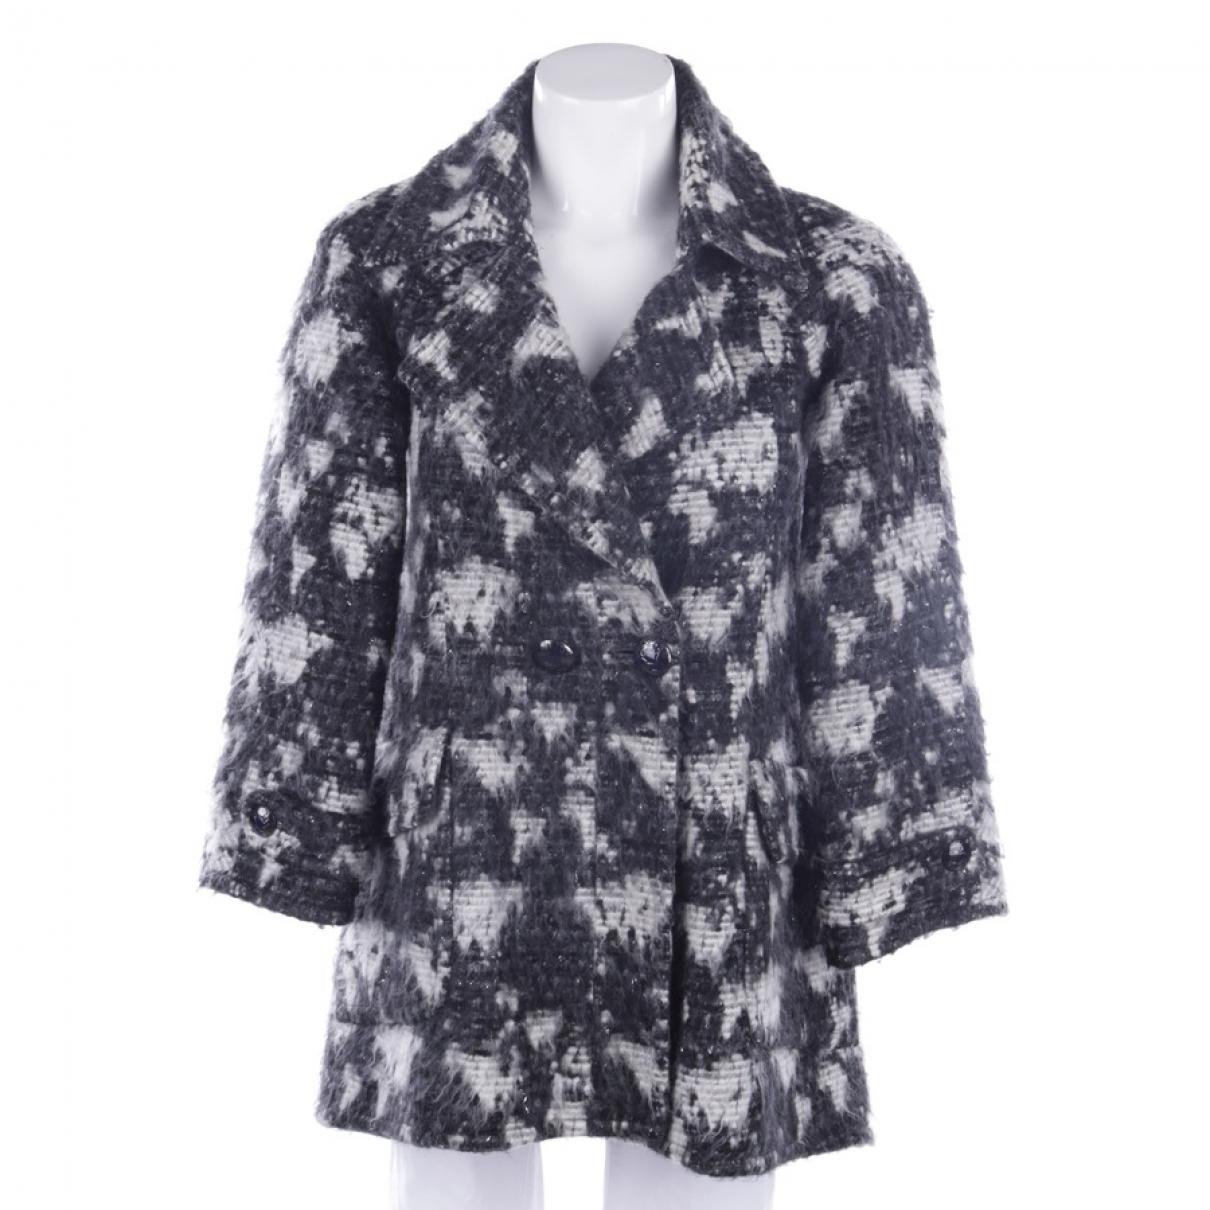 Chanel \N Black jacket for Women 36 FR